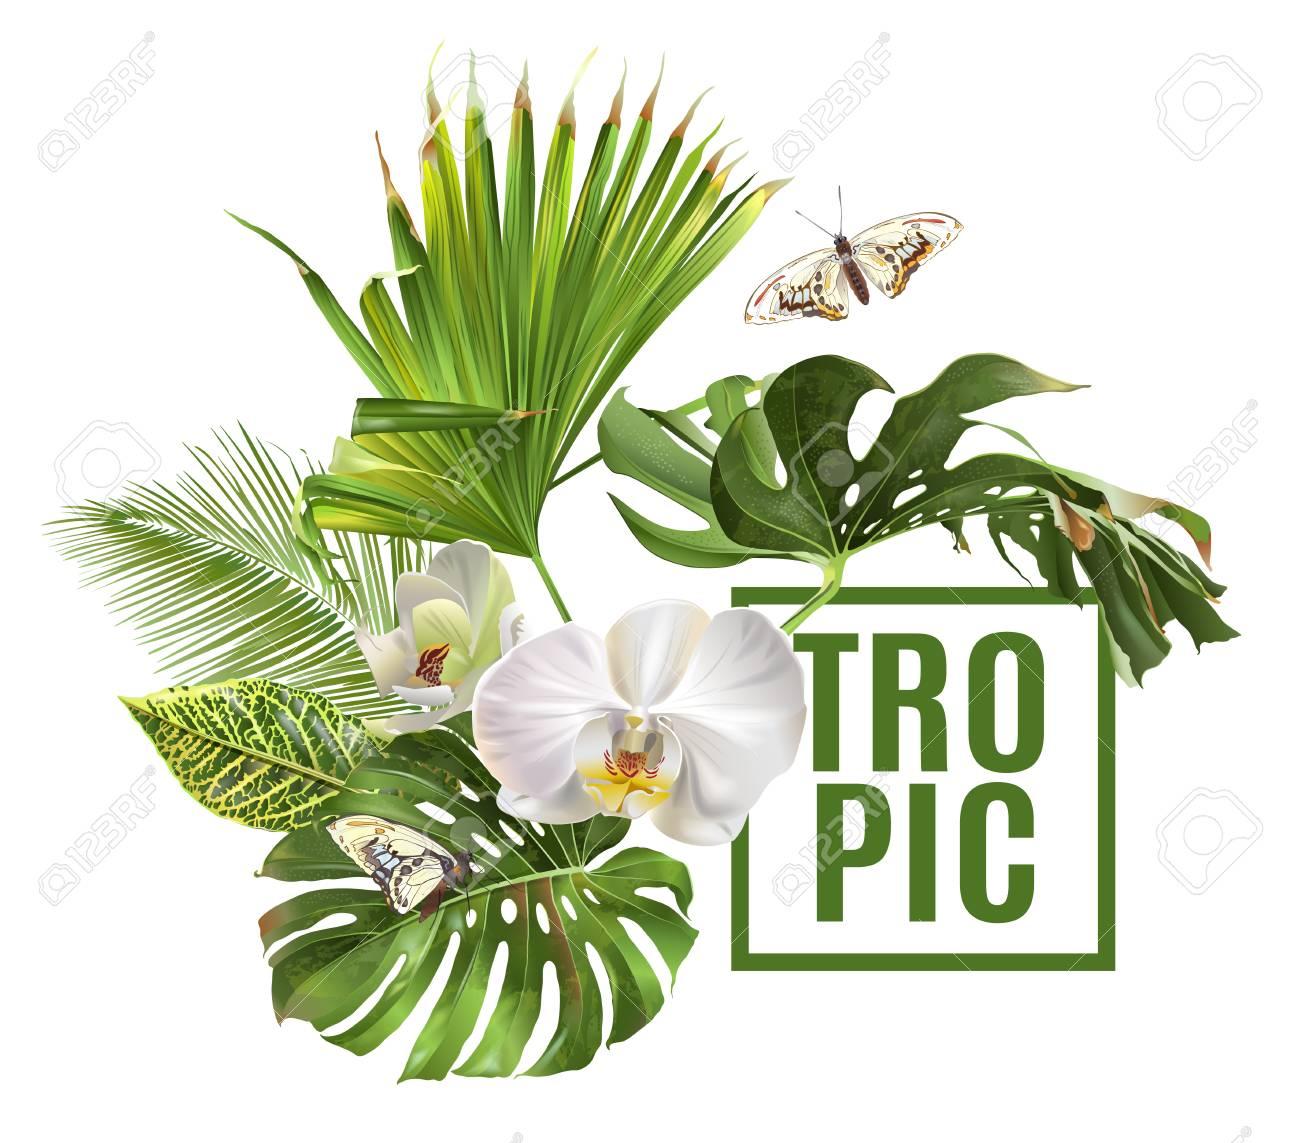 Tropic plants banner - 90041689